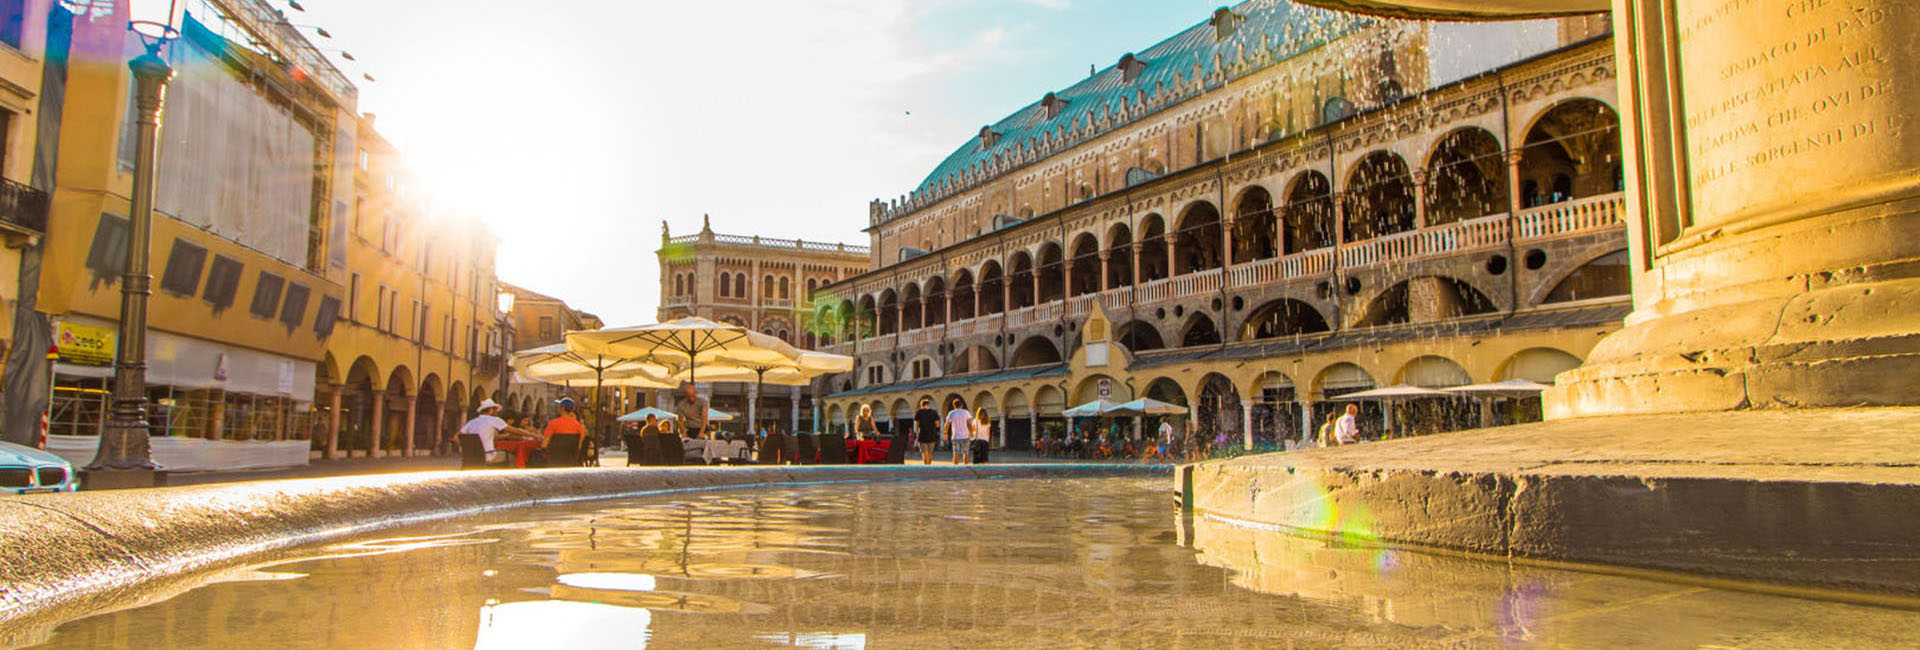 Padova Weekend ©Enrico Luzi